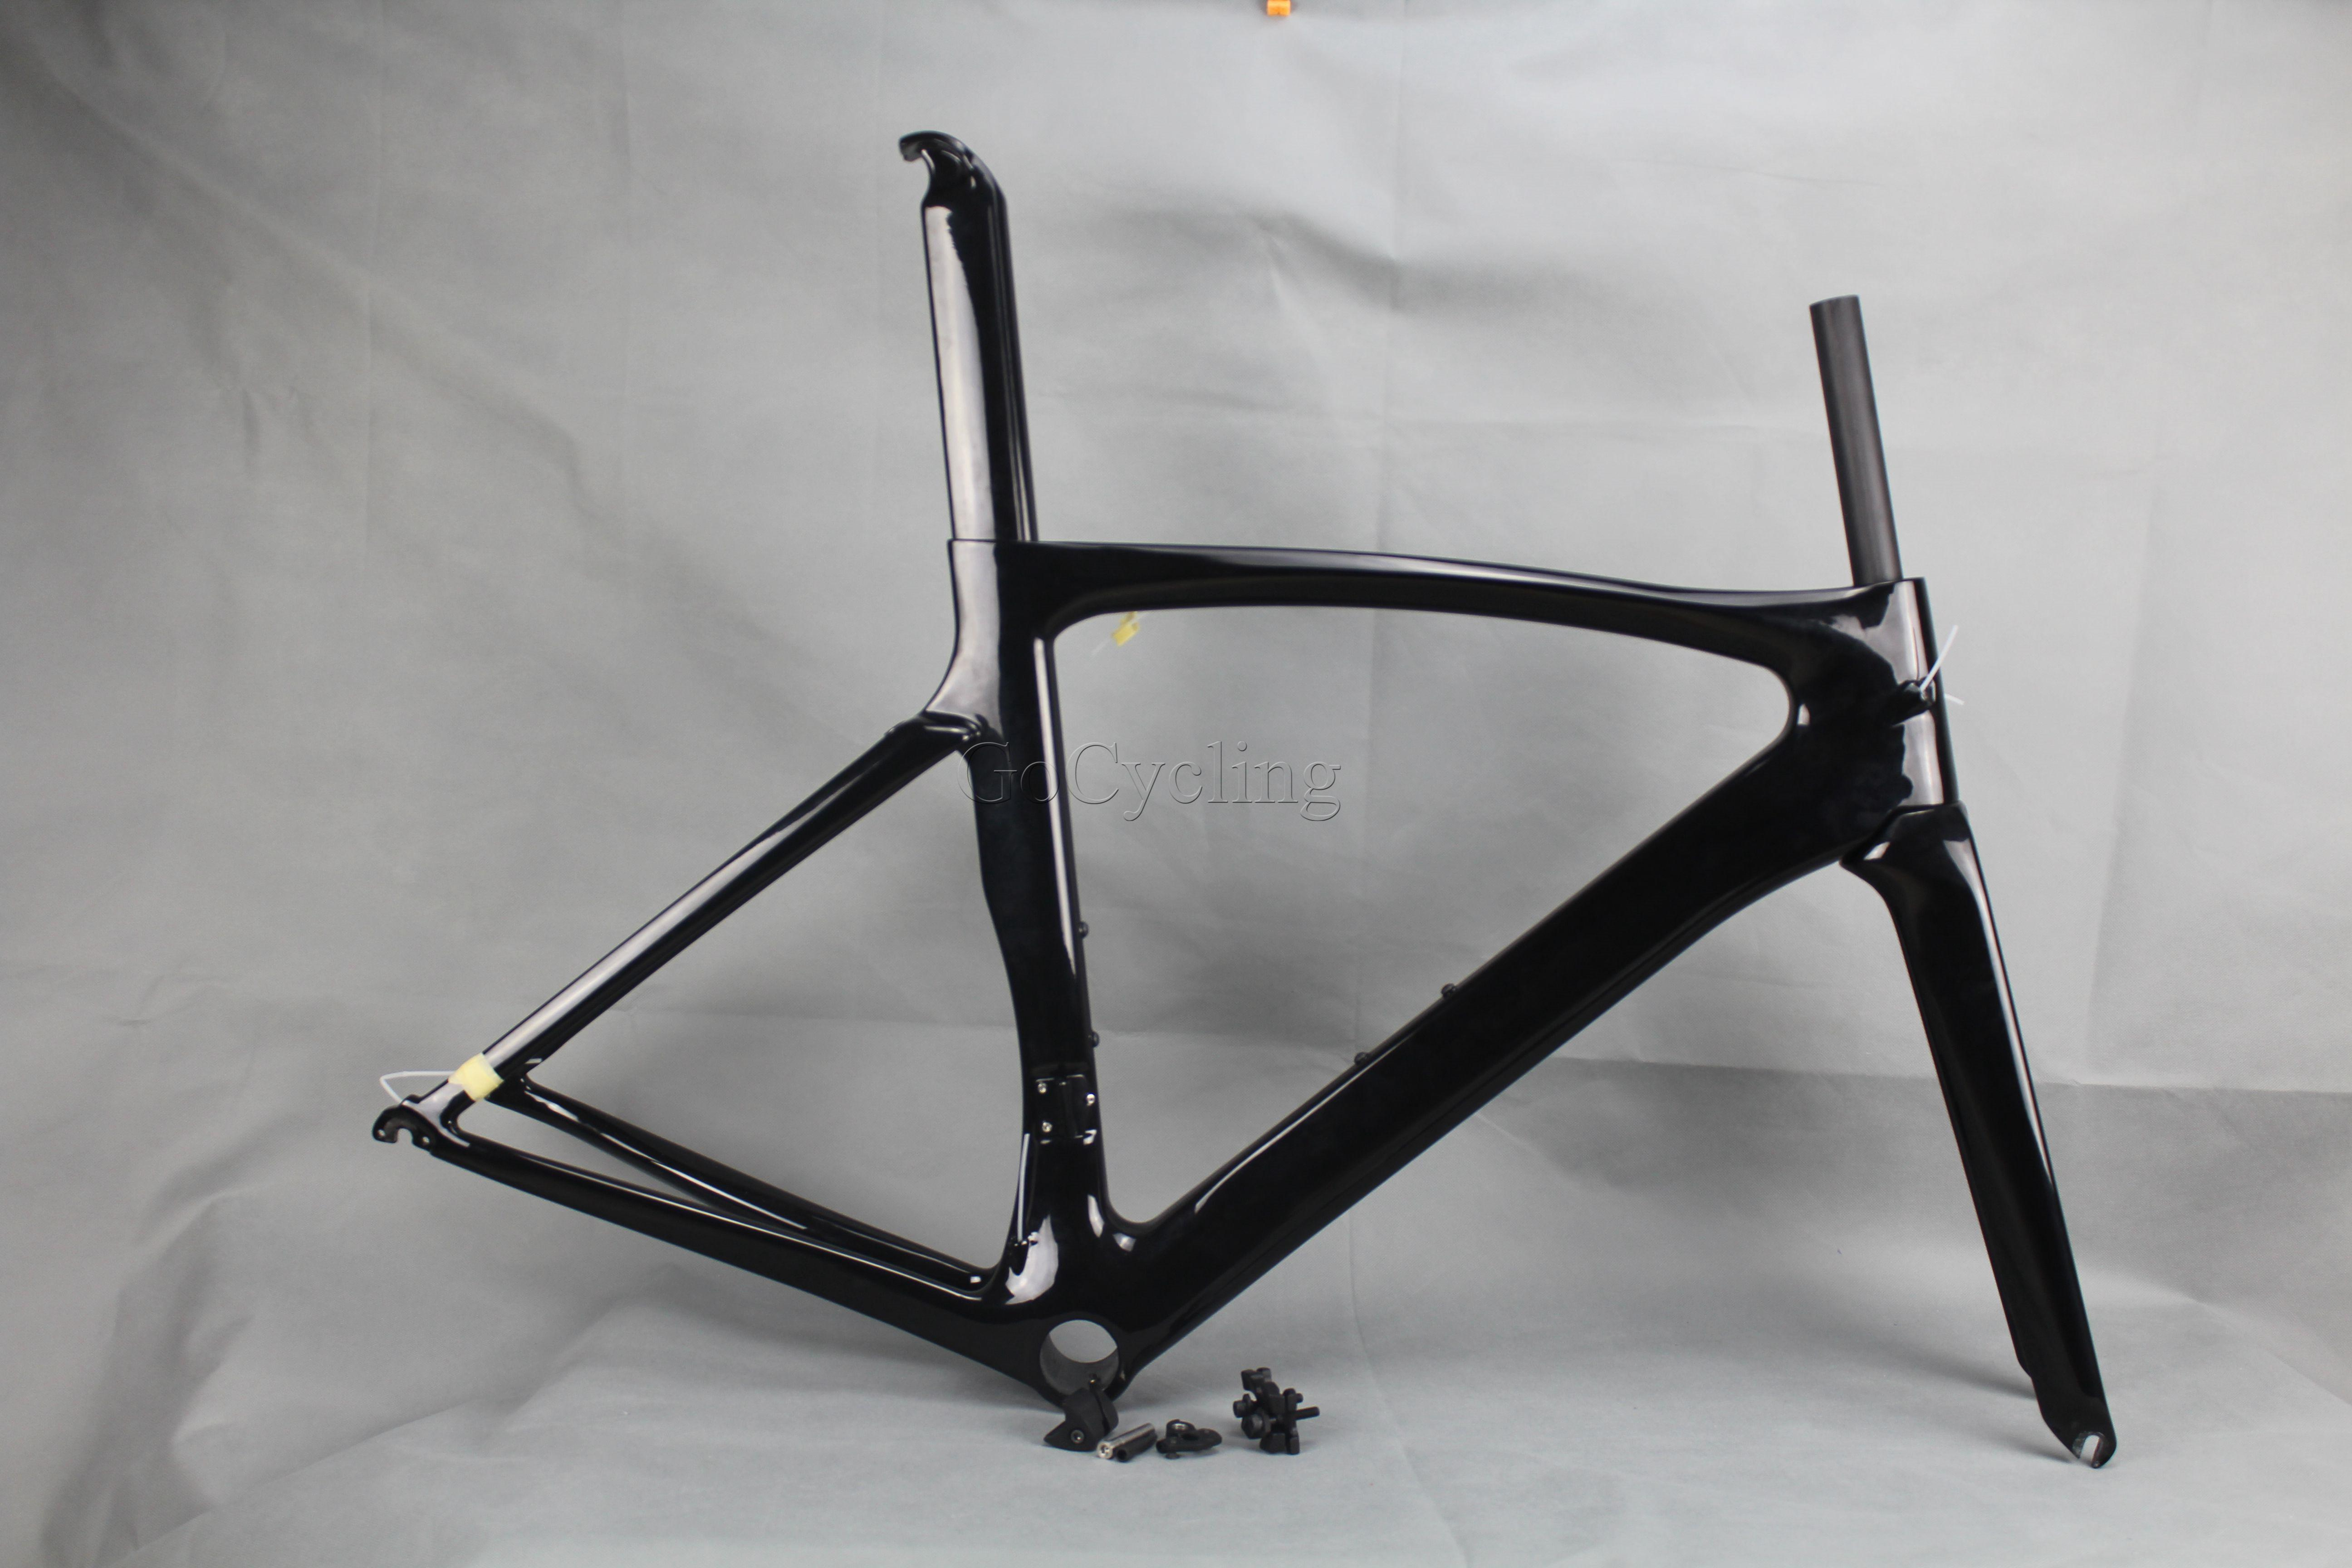 Cadres de vélo de route en carbone 2016 Cadres de vélo cadre de course de course brillant noir